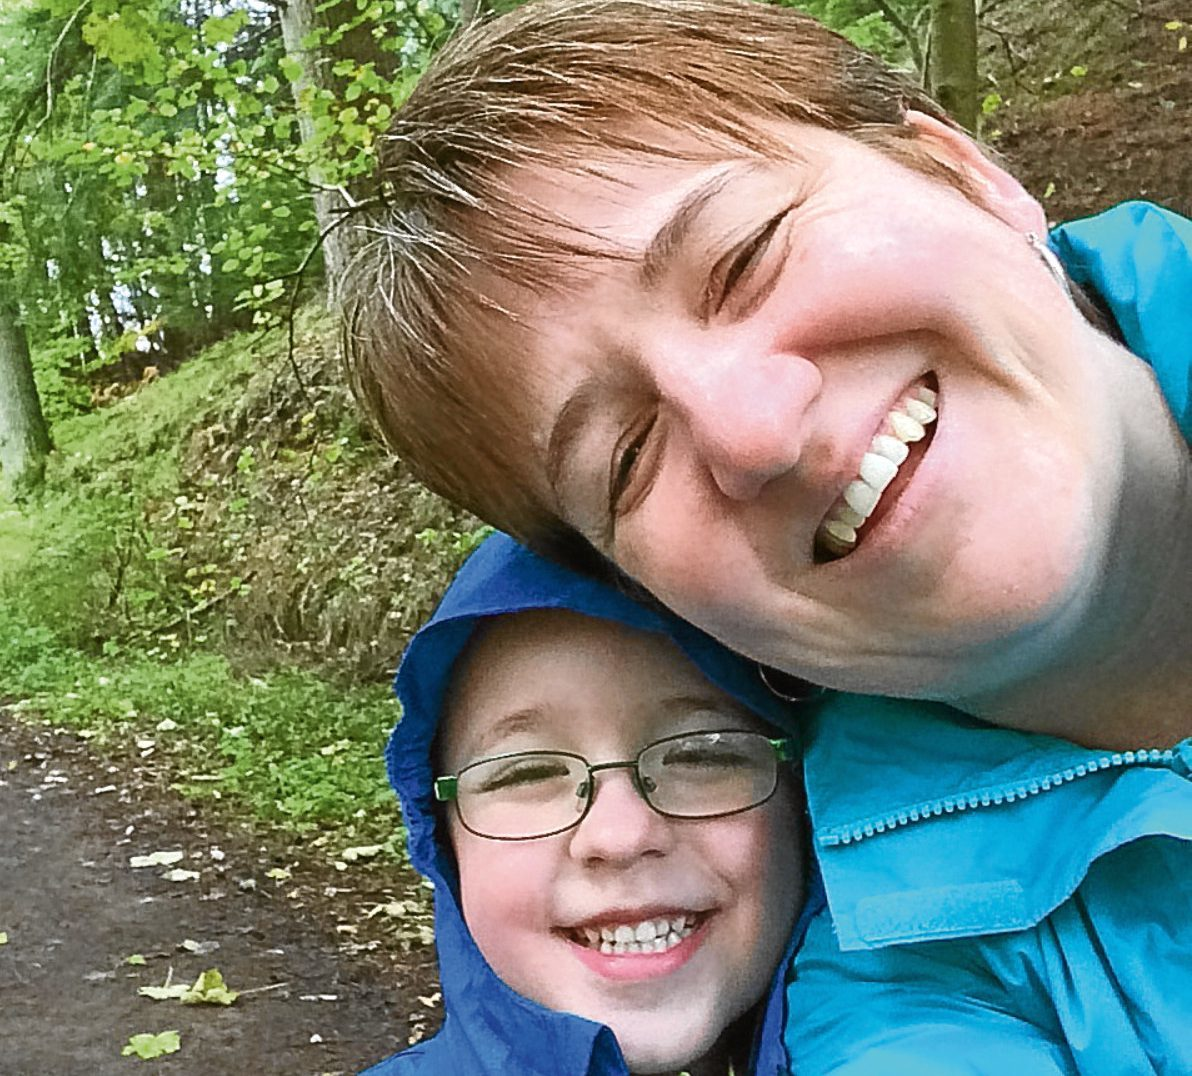 Denise Middler with her son Owen.